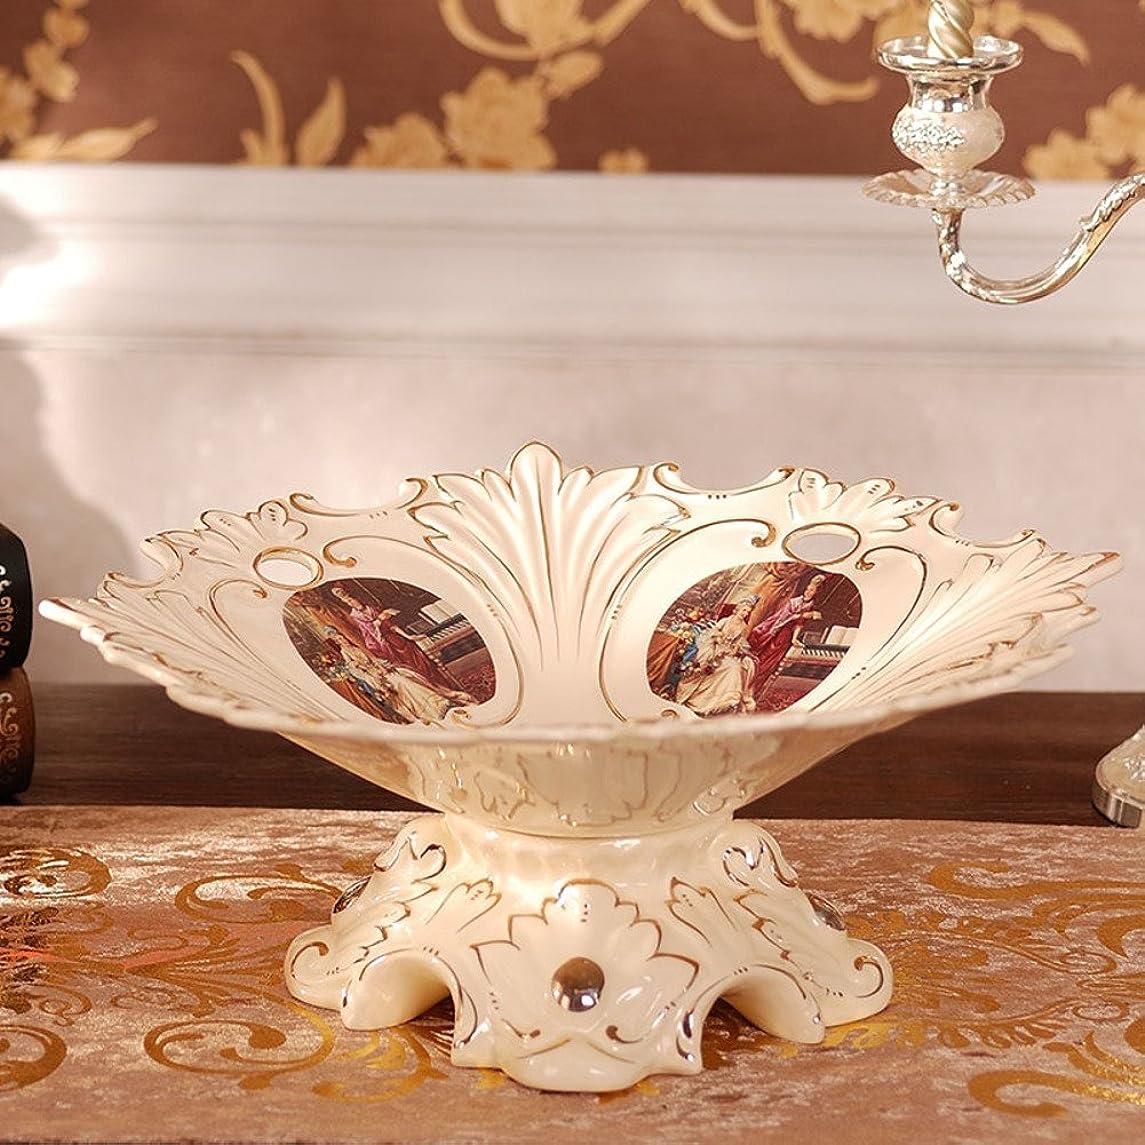 LIUYUN European Style,Ceramic Fruit Bowl Dried Fruit-Box Creative Candy Dish-B